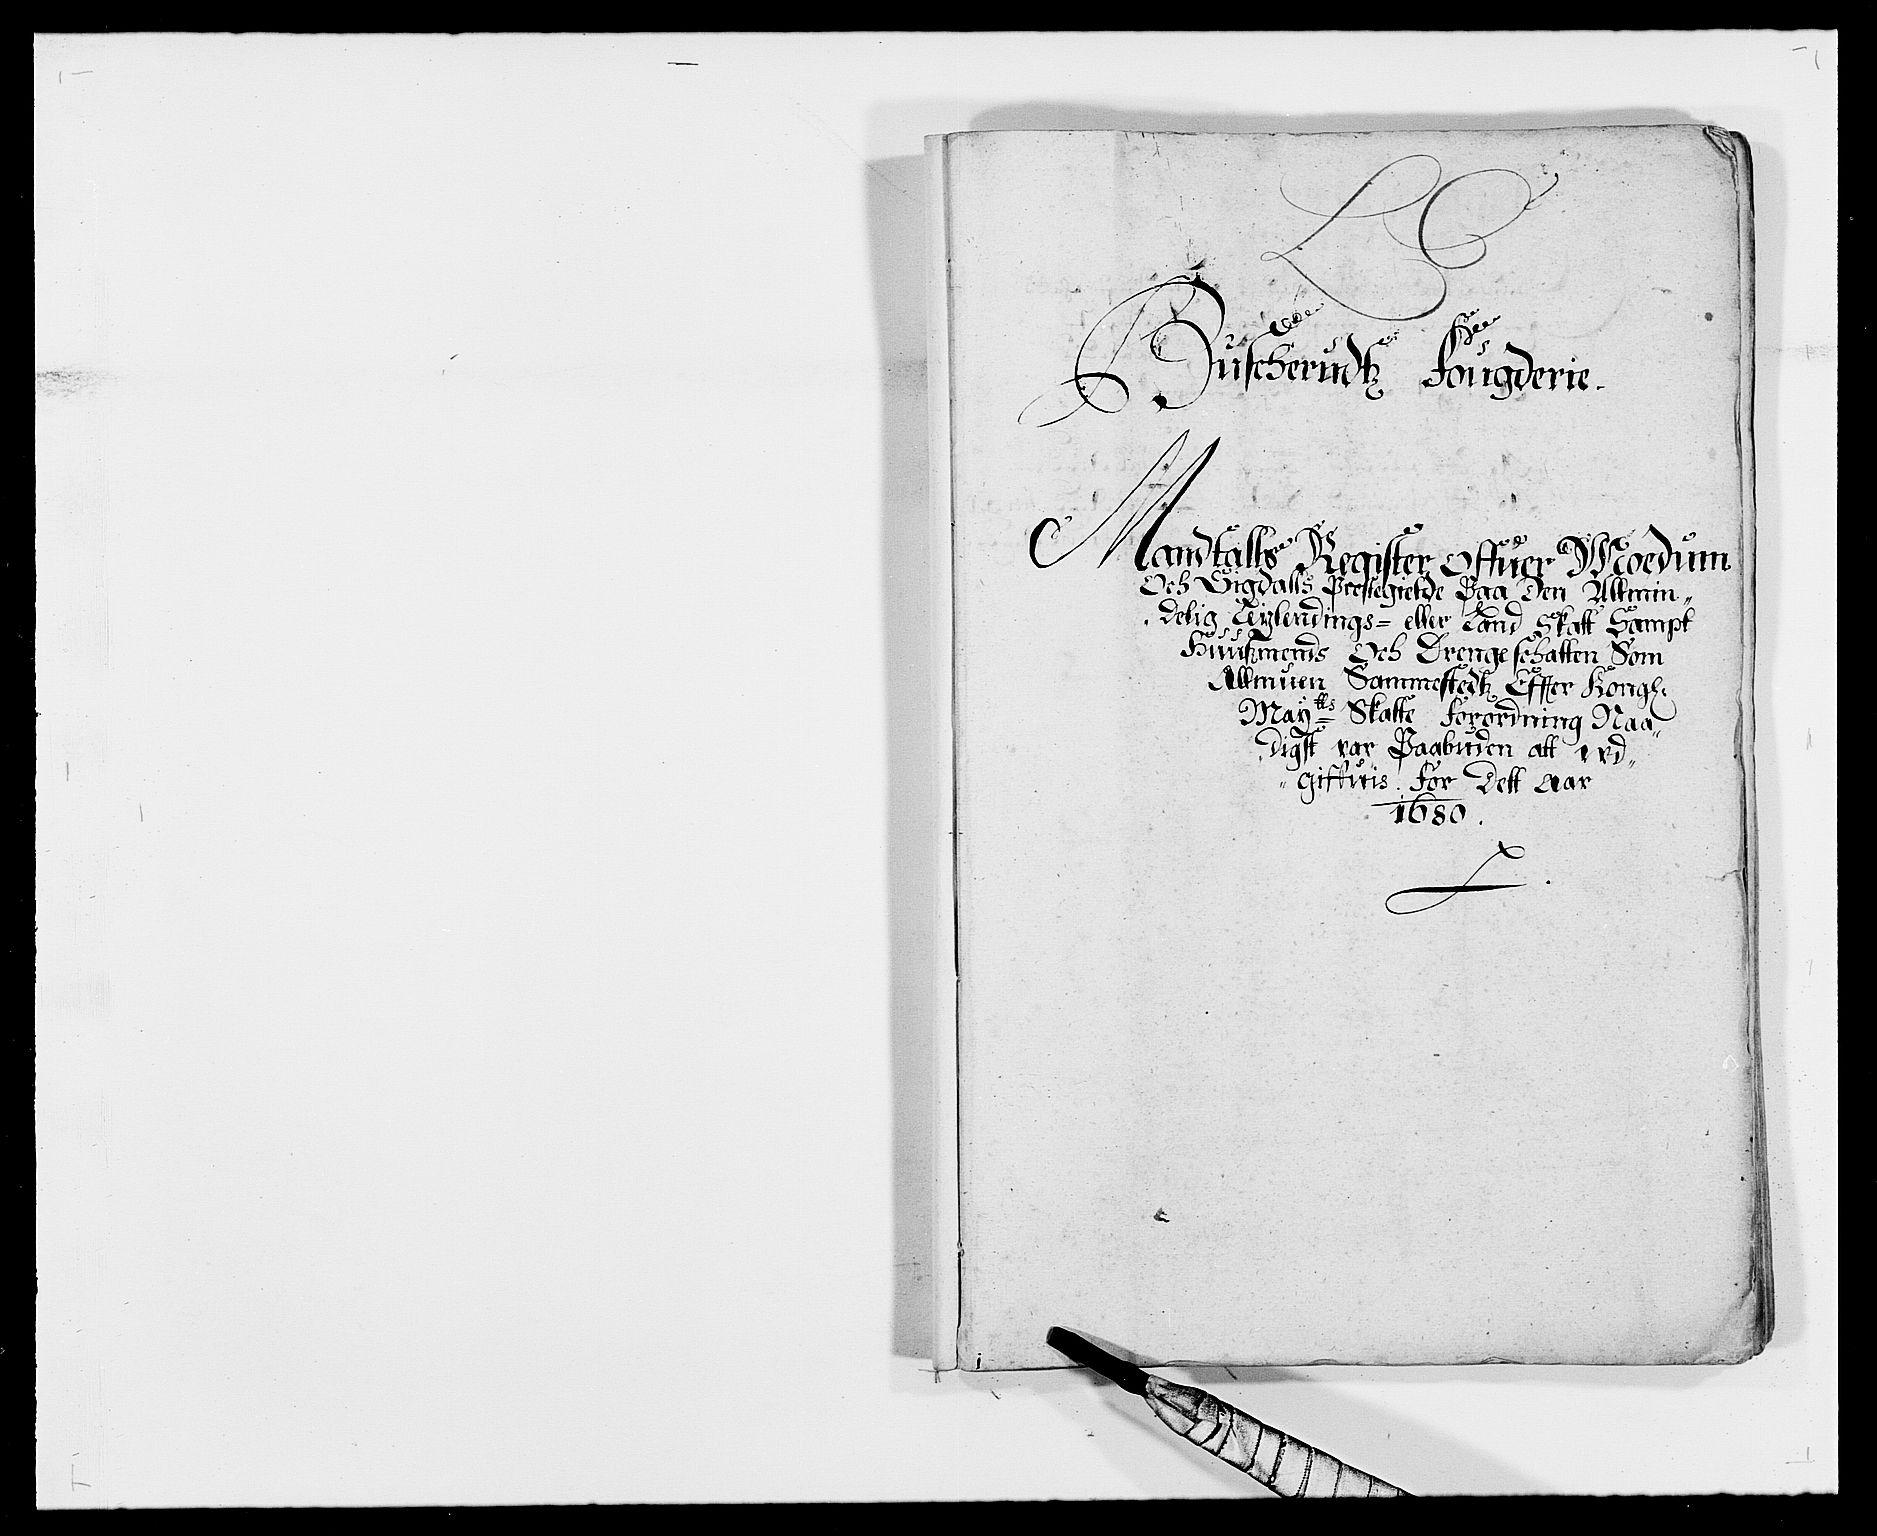 RA, Rentekammeret inntil 1814, Reviderte regnskaper, Fogderegnskap, R25/L1675: Fogderegnskap Buskerud, 1678-1681, s. 38